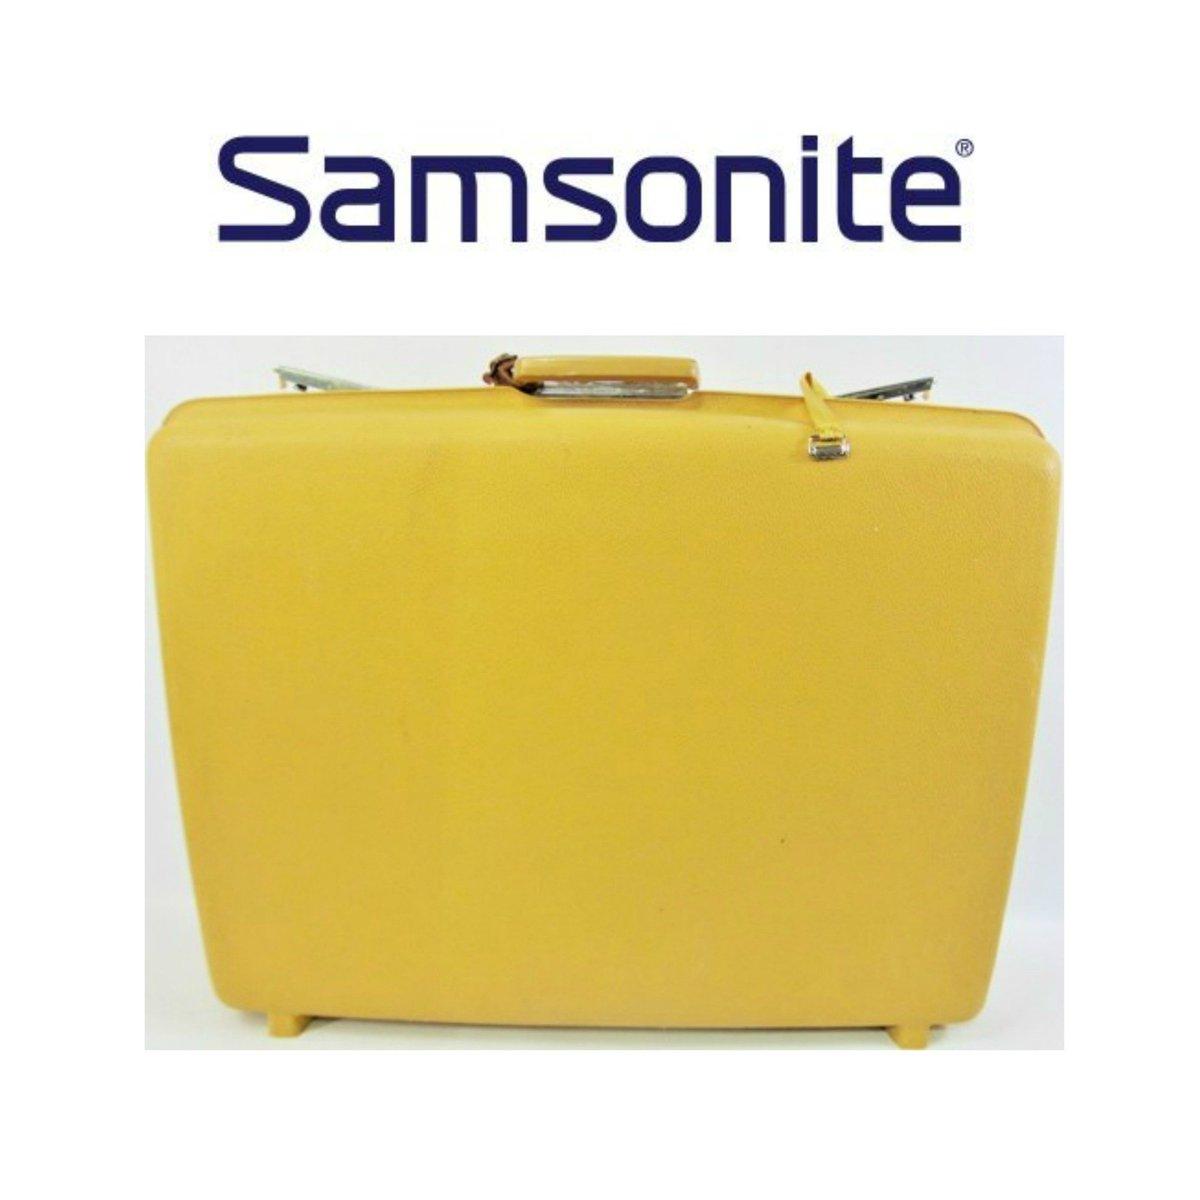 8d60cf945 Vintage Samsonite Saturn Yellow Hard Suitcase, Vintage Samsonite Luggage,  Yellow Suitcase, 1970s Luggage, Retro Photo Prop https://etsy.me/2qW4FH6 ...